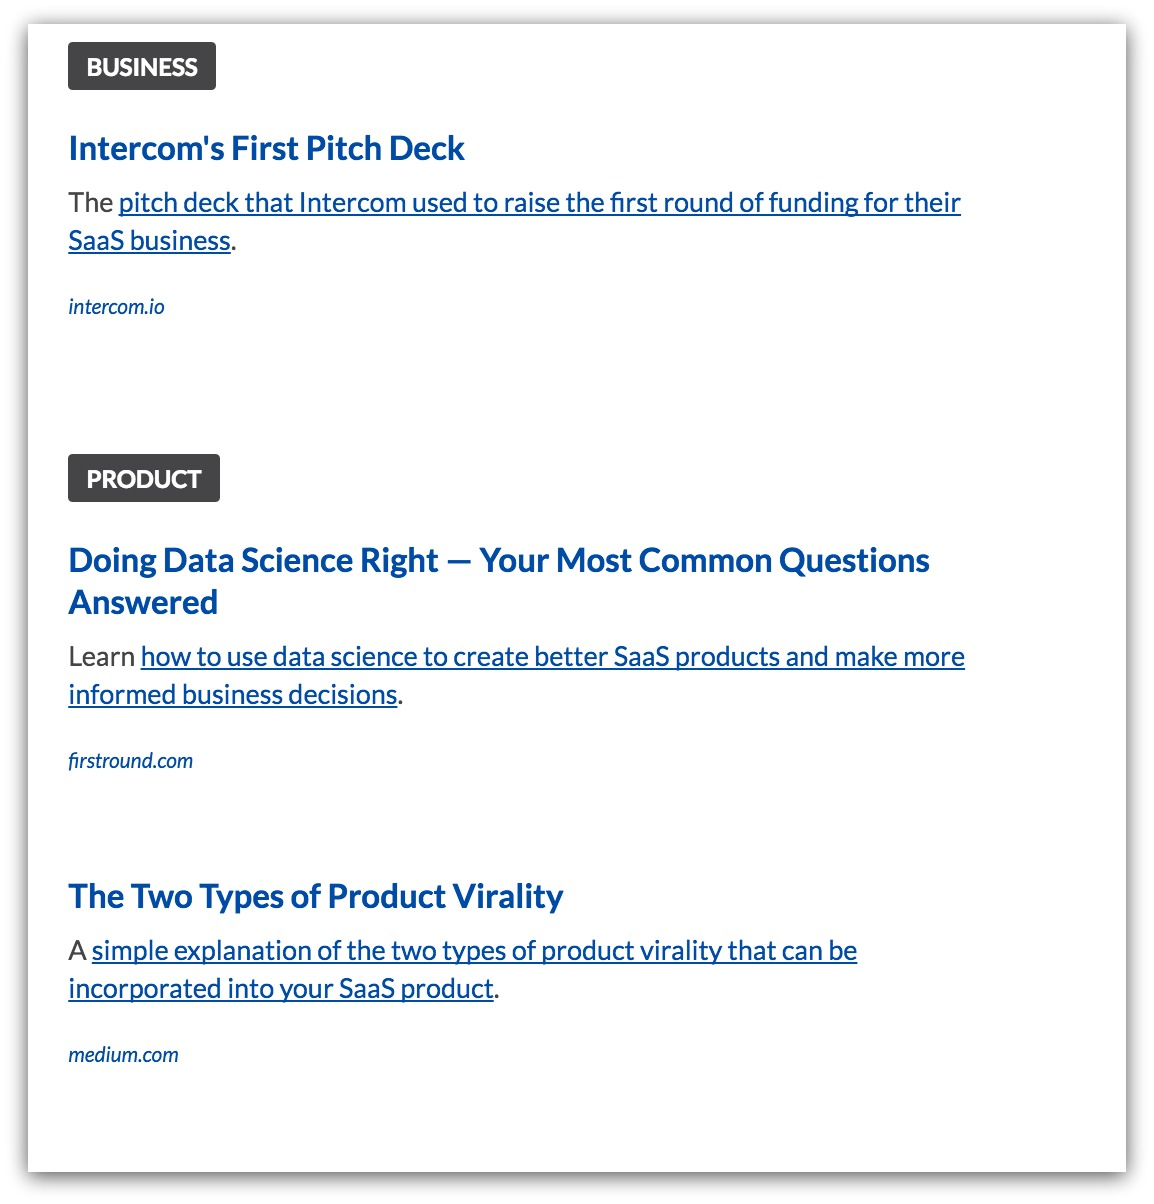 marketingland articles